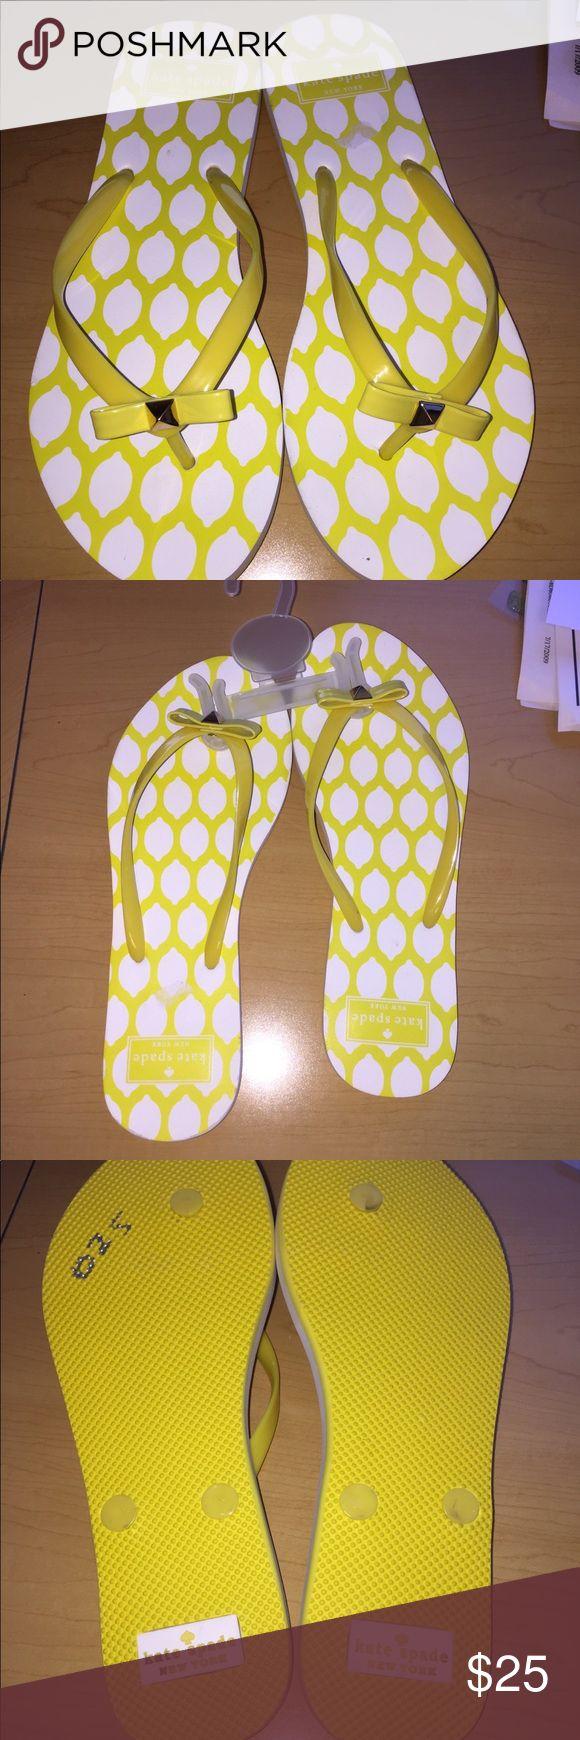 Kate Spade ♠️ yellow flip flops NWOT NWOT Kate Spade Yellow Flip Flops. Box not included kate spade Shoes Sandals